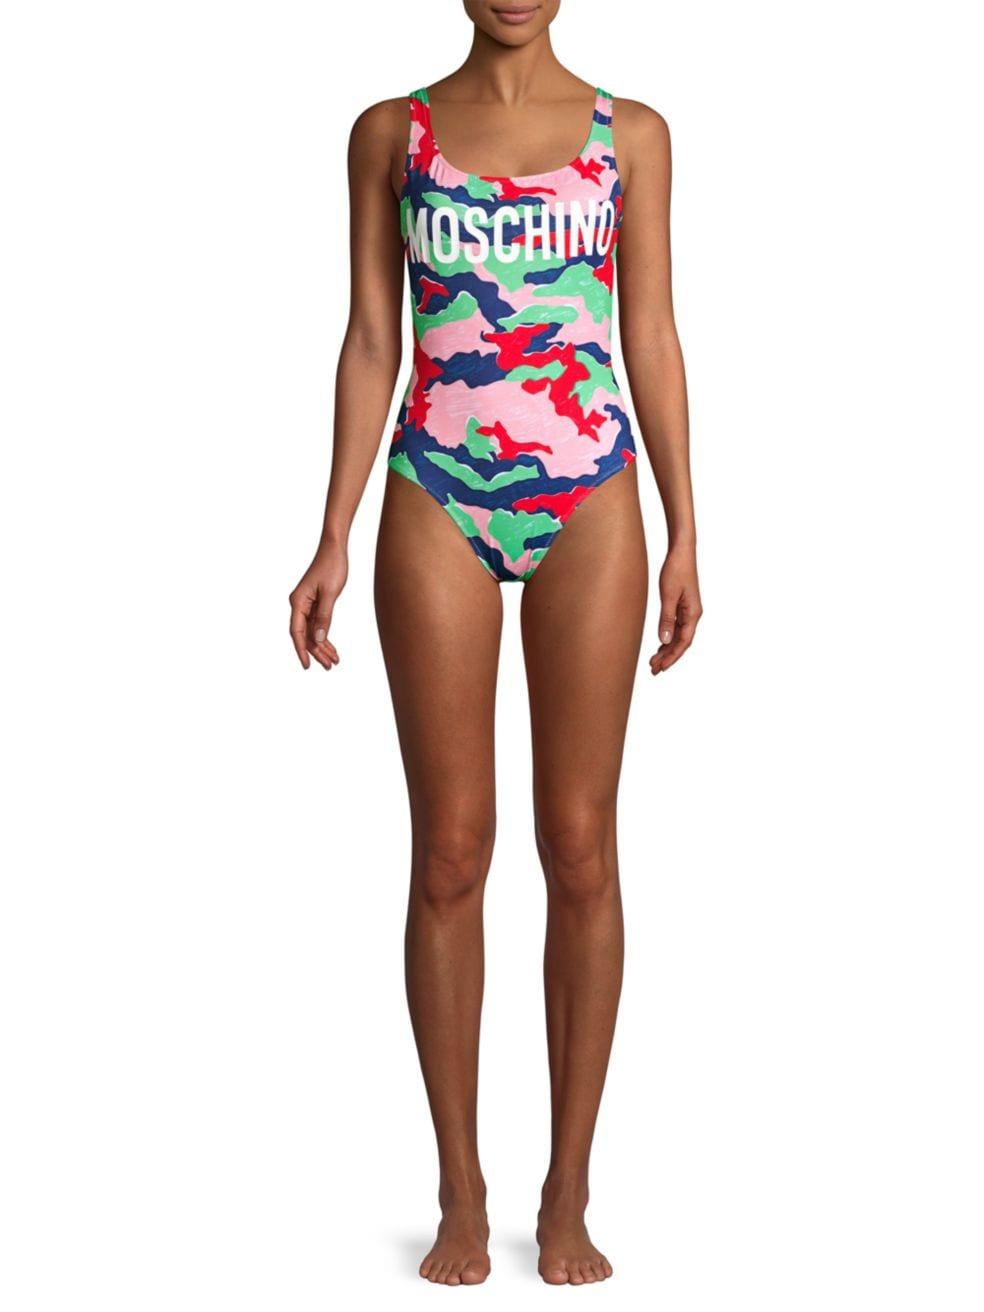 Moschino Camo One-Piece Swimsuit | SaksFifthAvenue